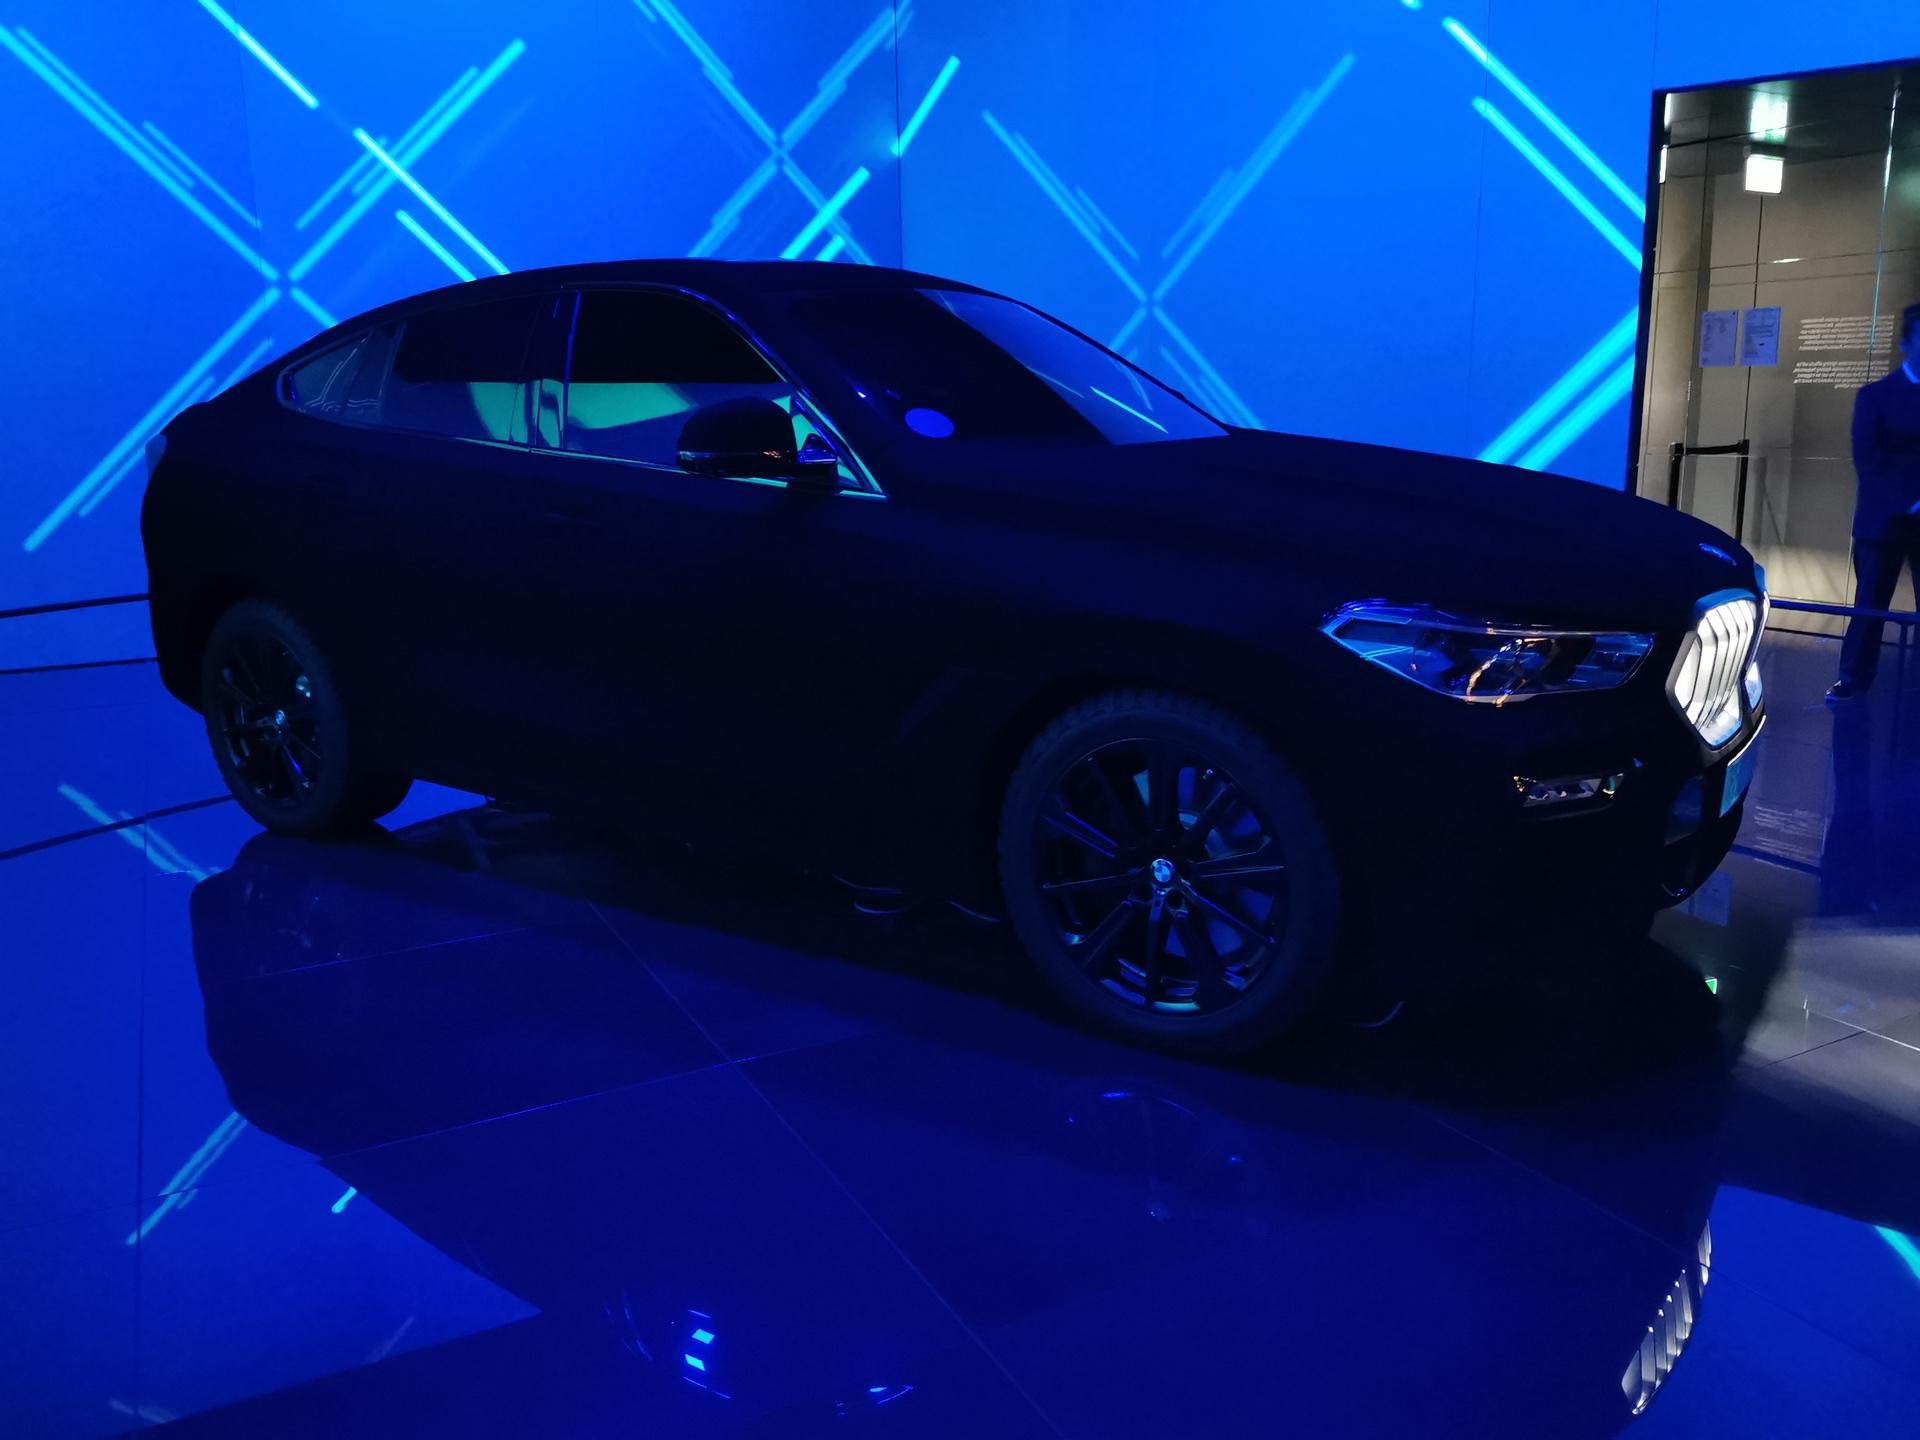 Bmw X6 Vantablack Blackest Black In The World Of Cars